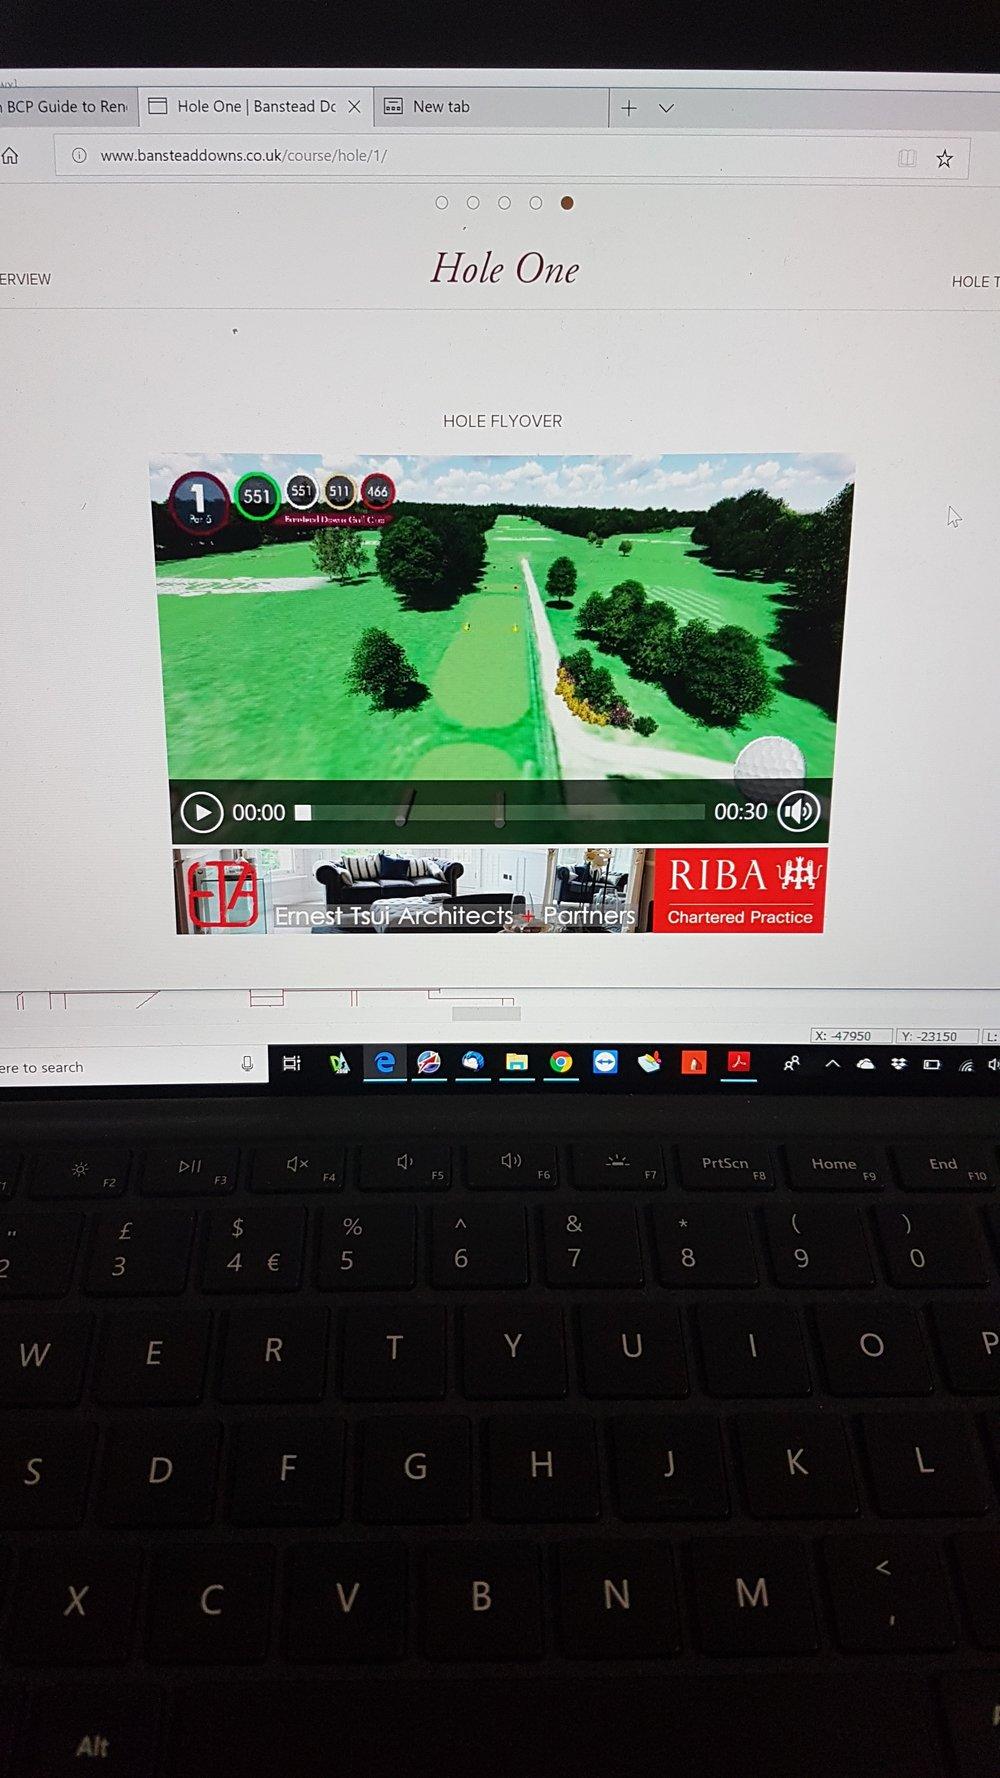 Sponsored hole app.